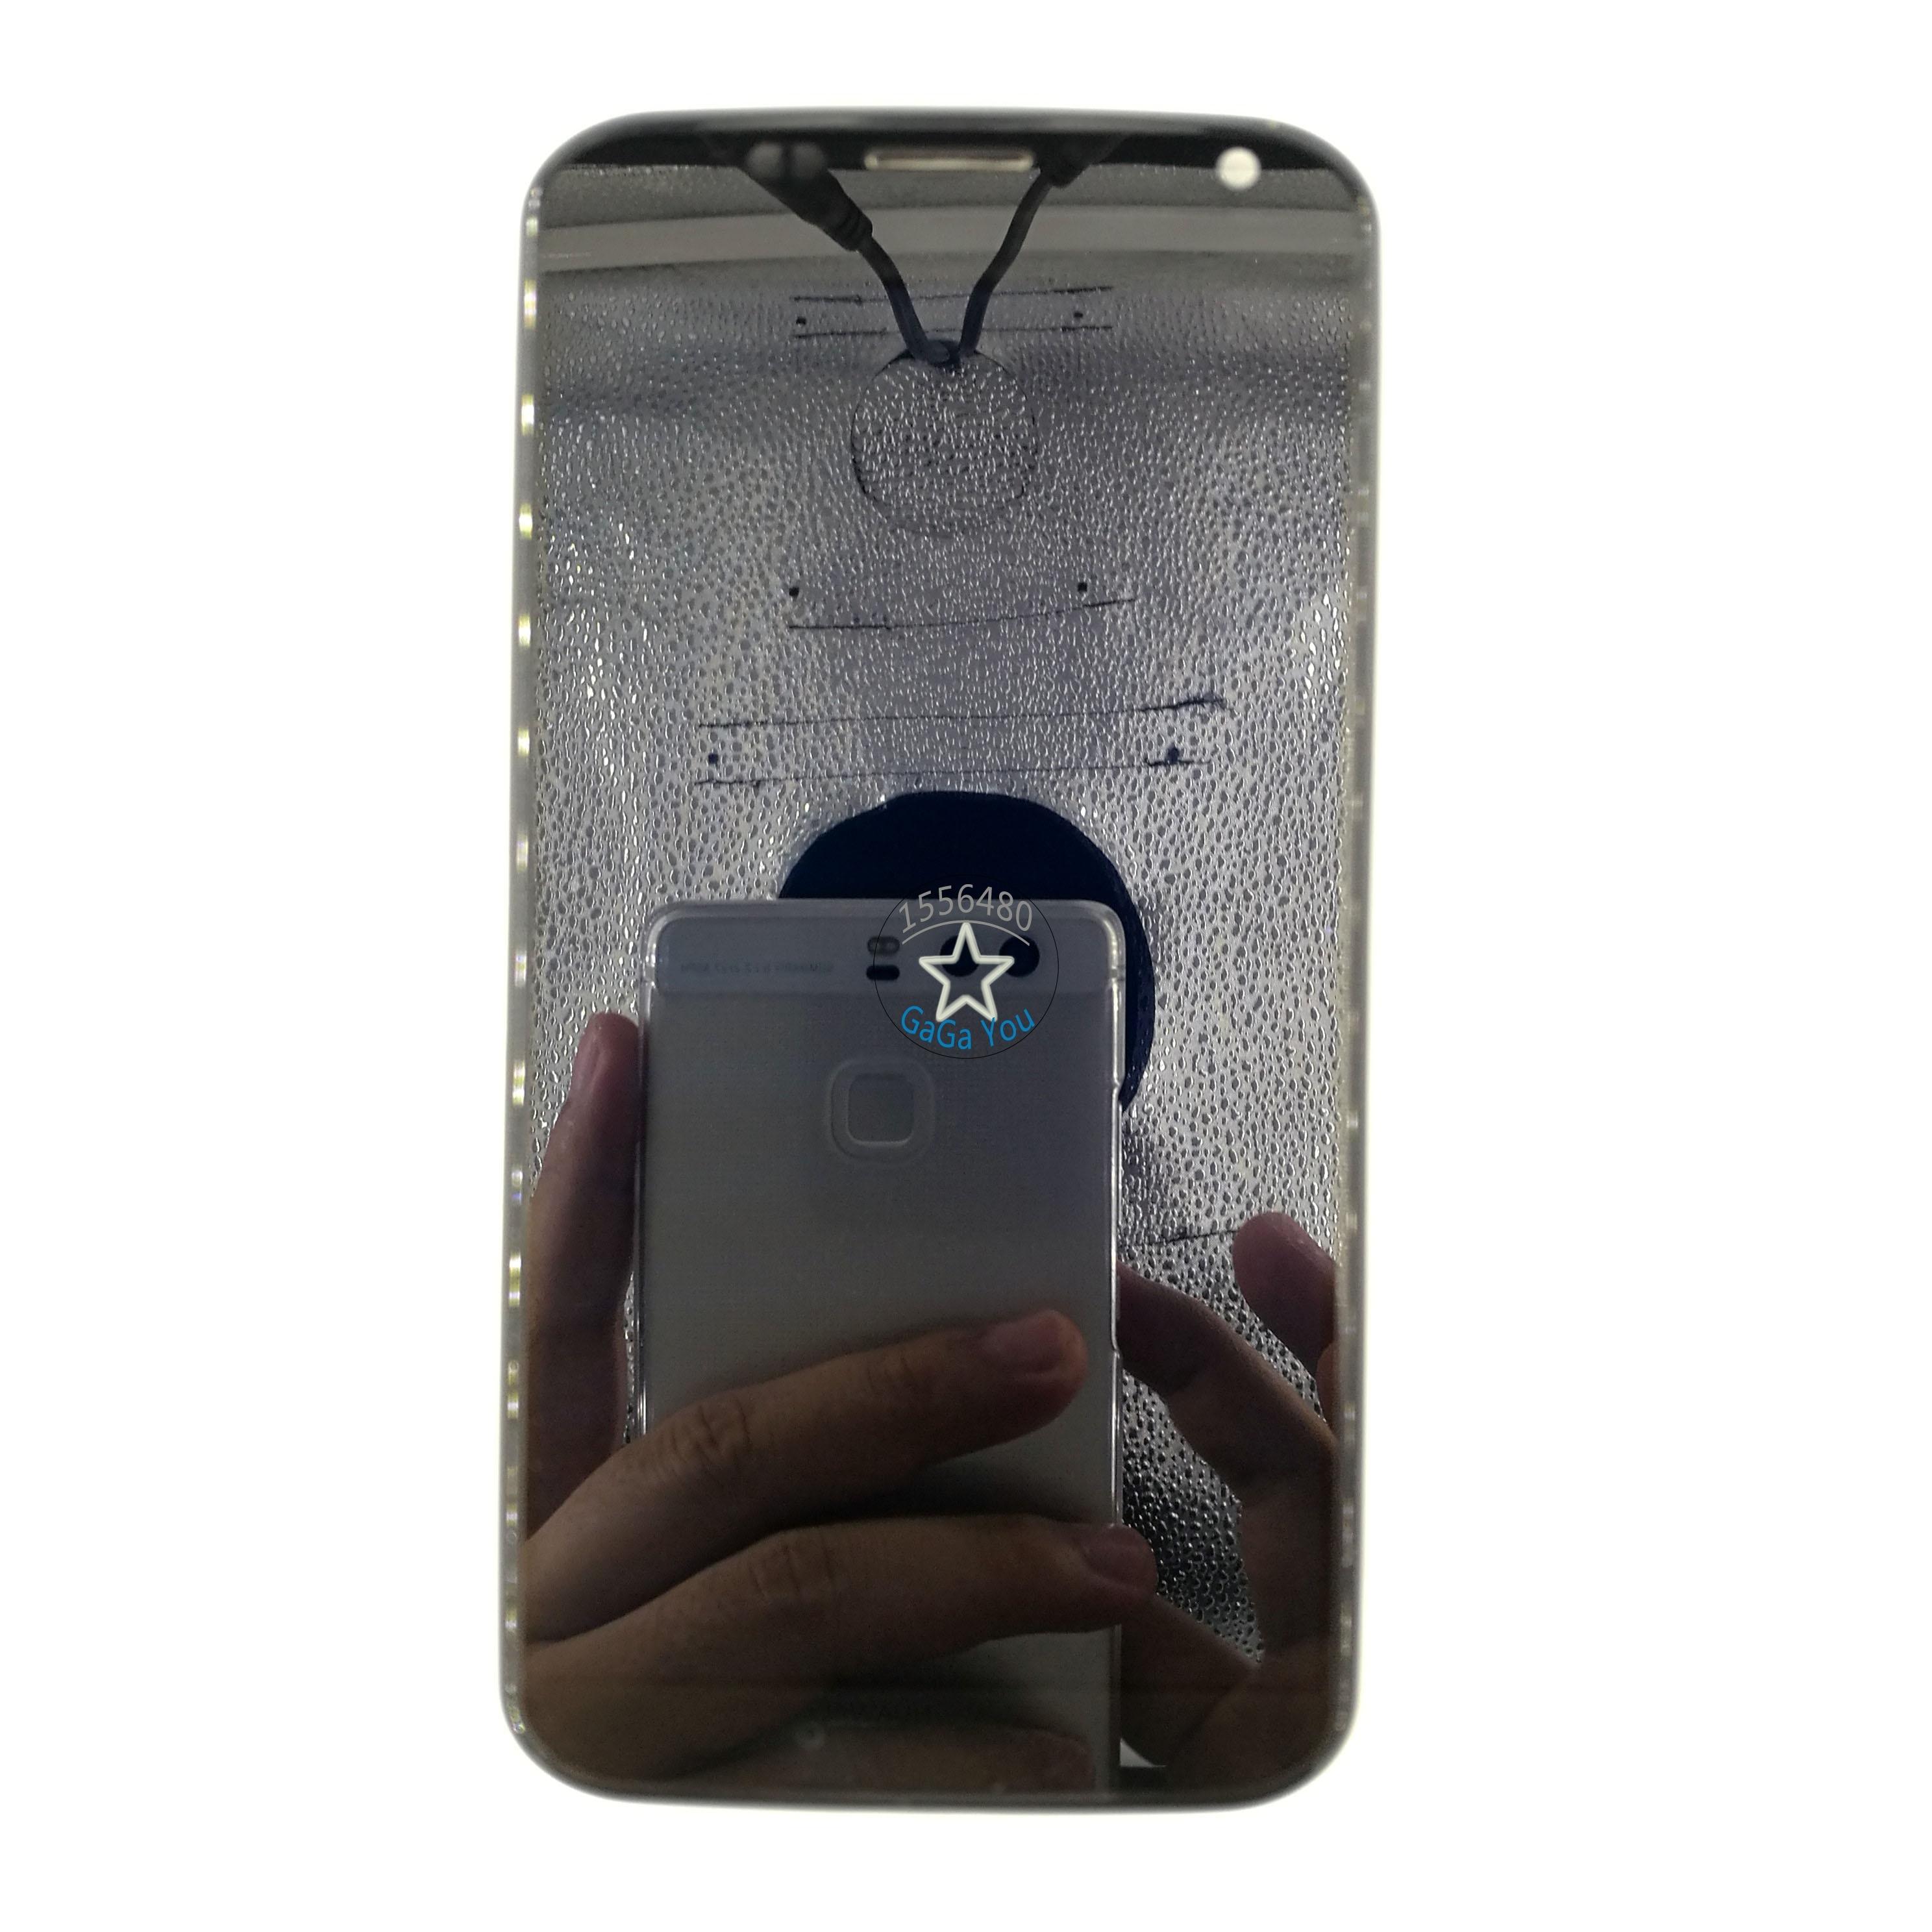 ФОТО Original LCD Display Touch Screen Digitizer Assembly+Frame For Motorola Moto X XT1052 XT1058 XT1053 XT1056 XT1060 XT1055 Parts